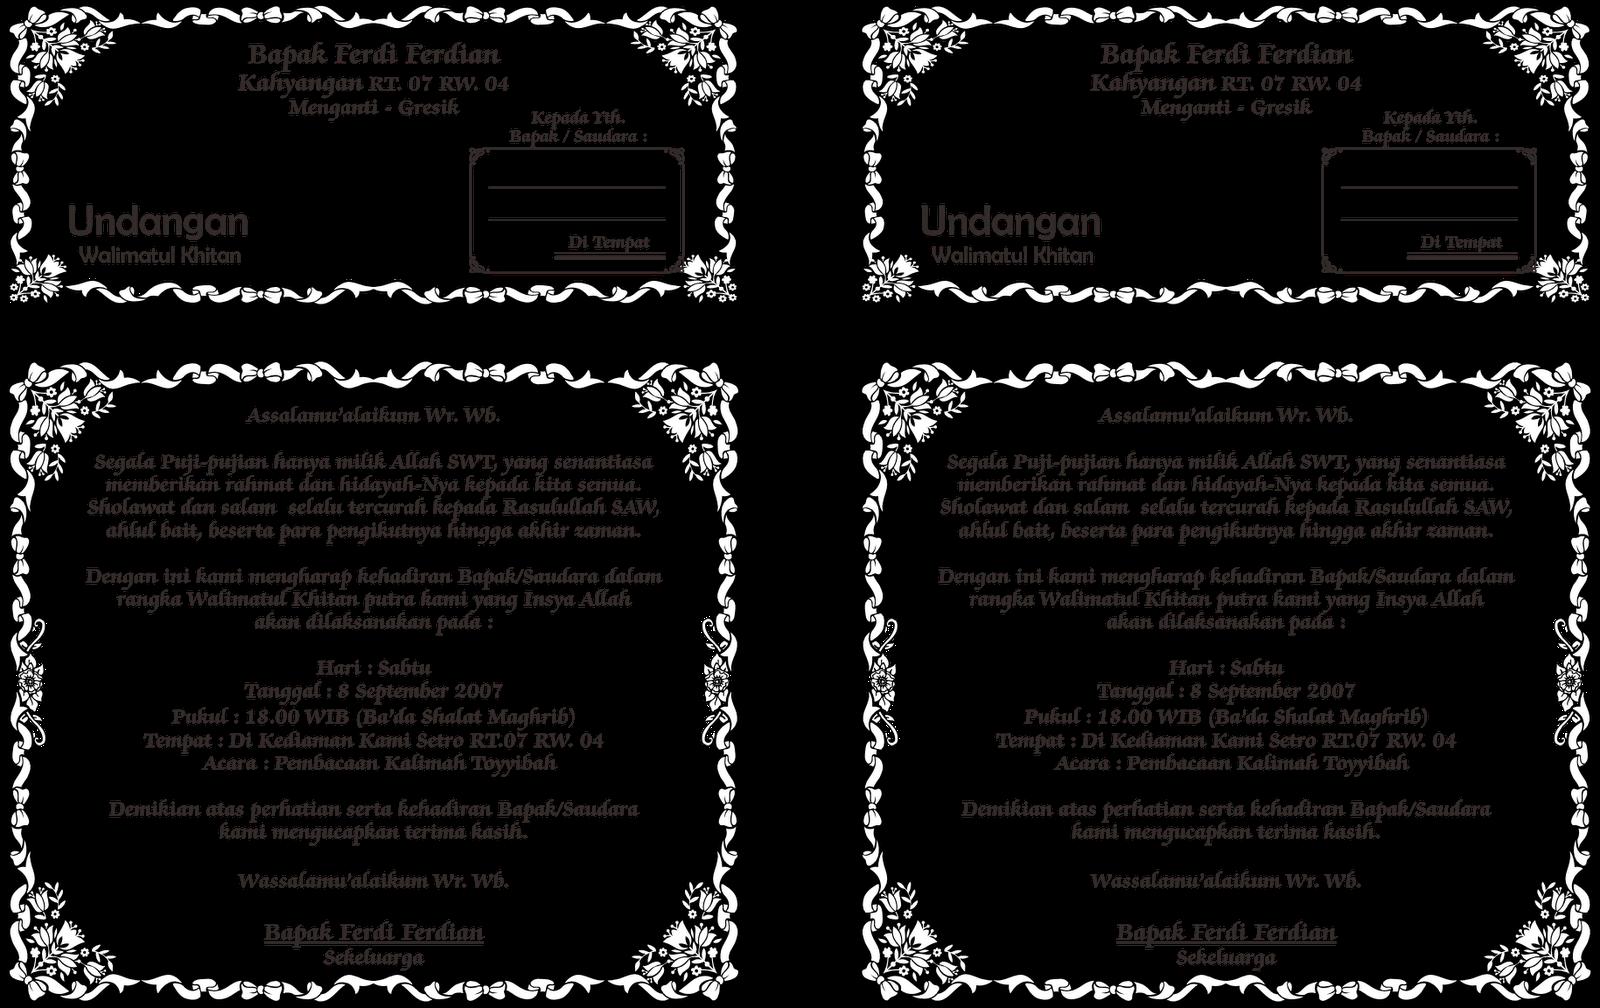 contoh gambar undangan walimatul khitan download format coreldraw via ...